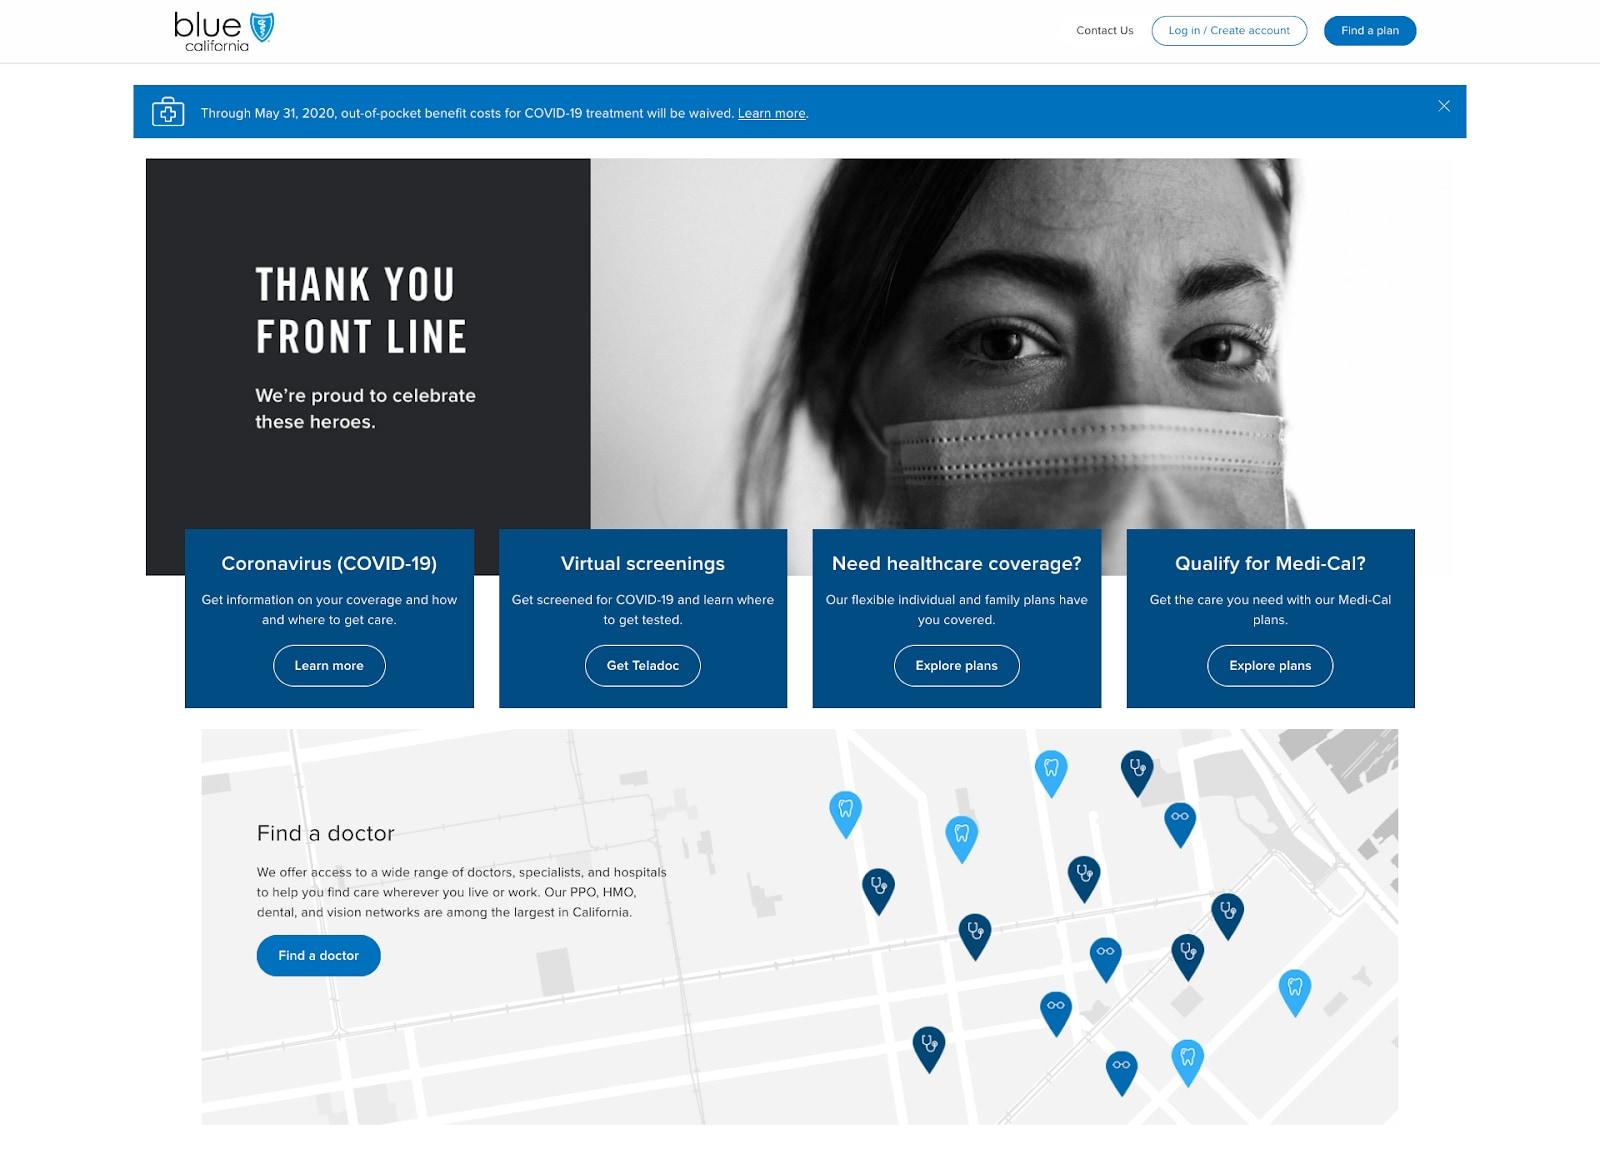 Crisis design on the Blue Shield of California website